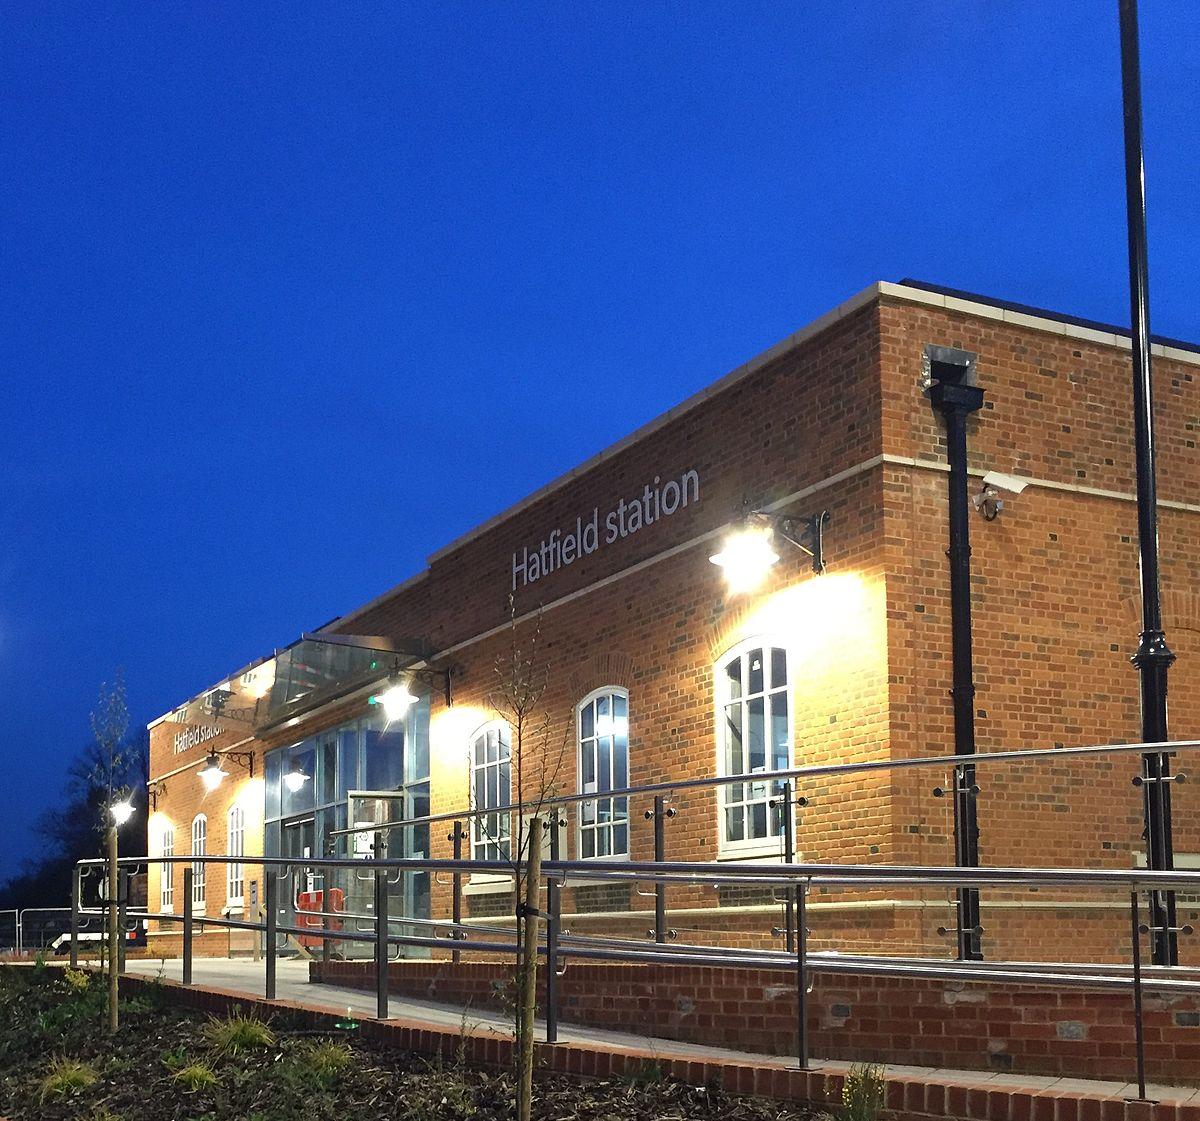 Hatfield railway station - Wikipedia